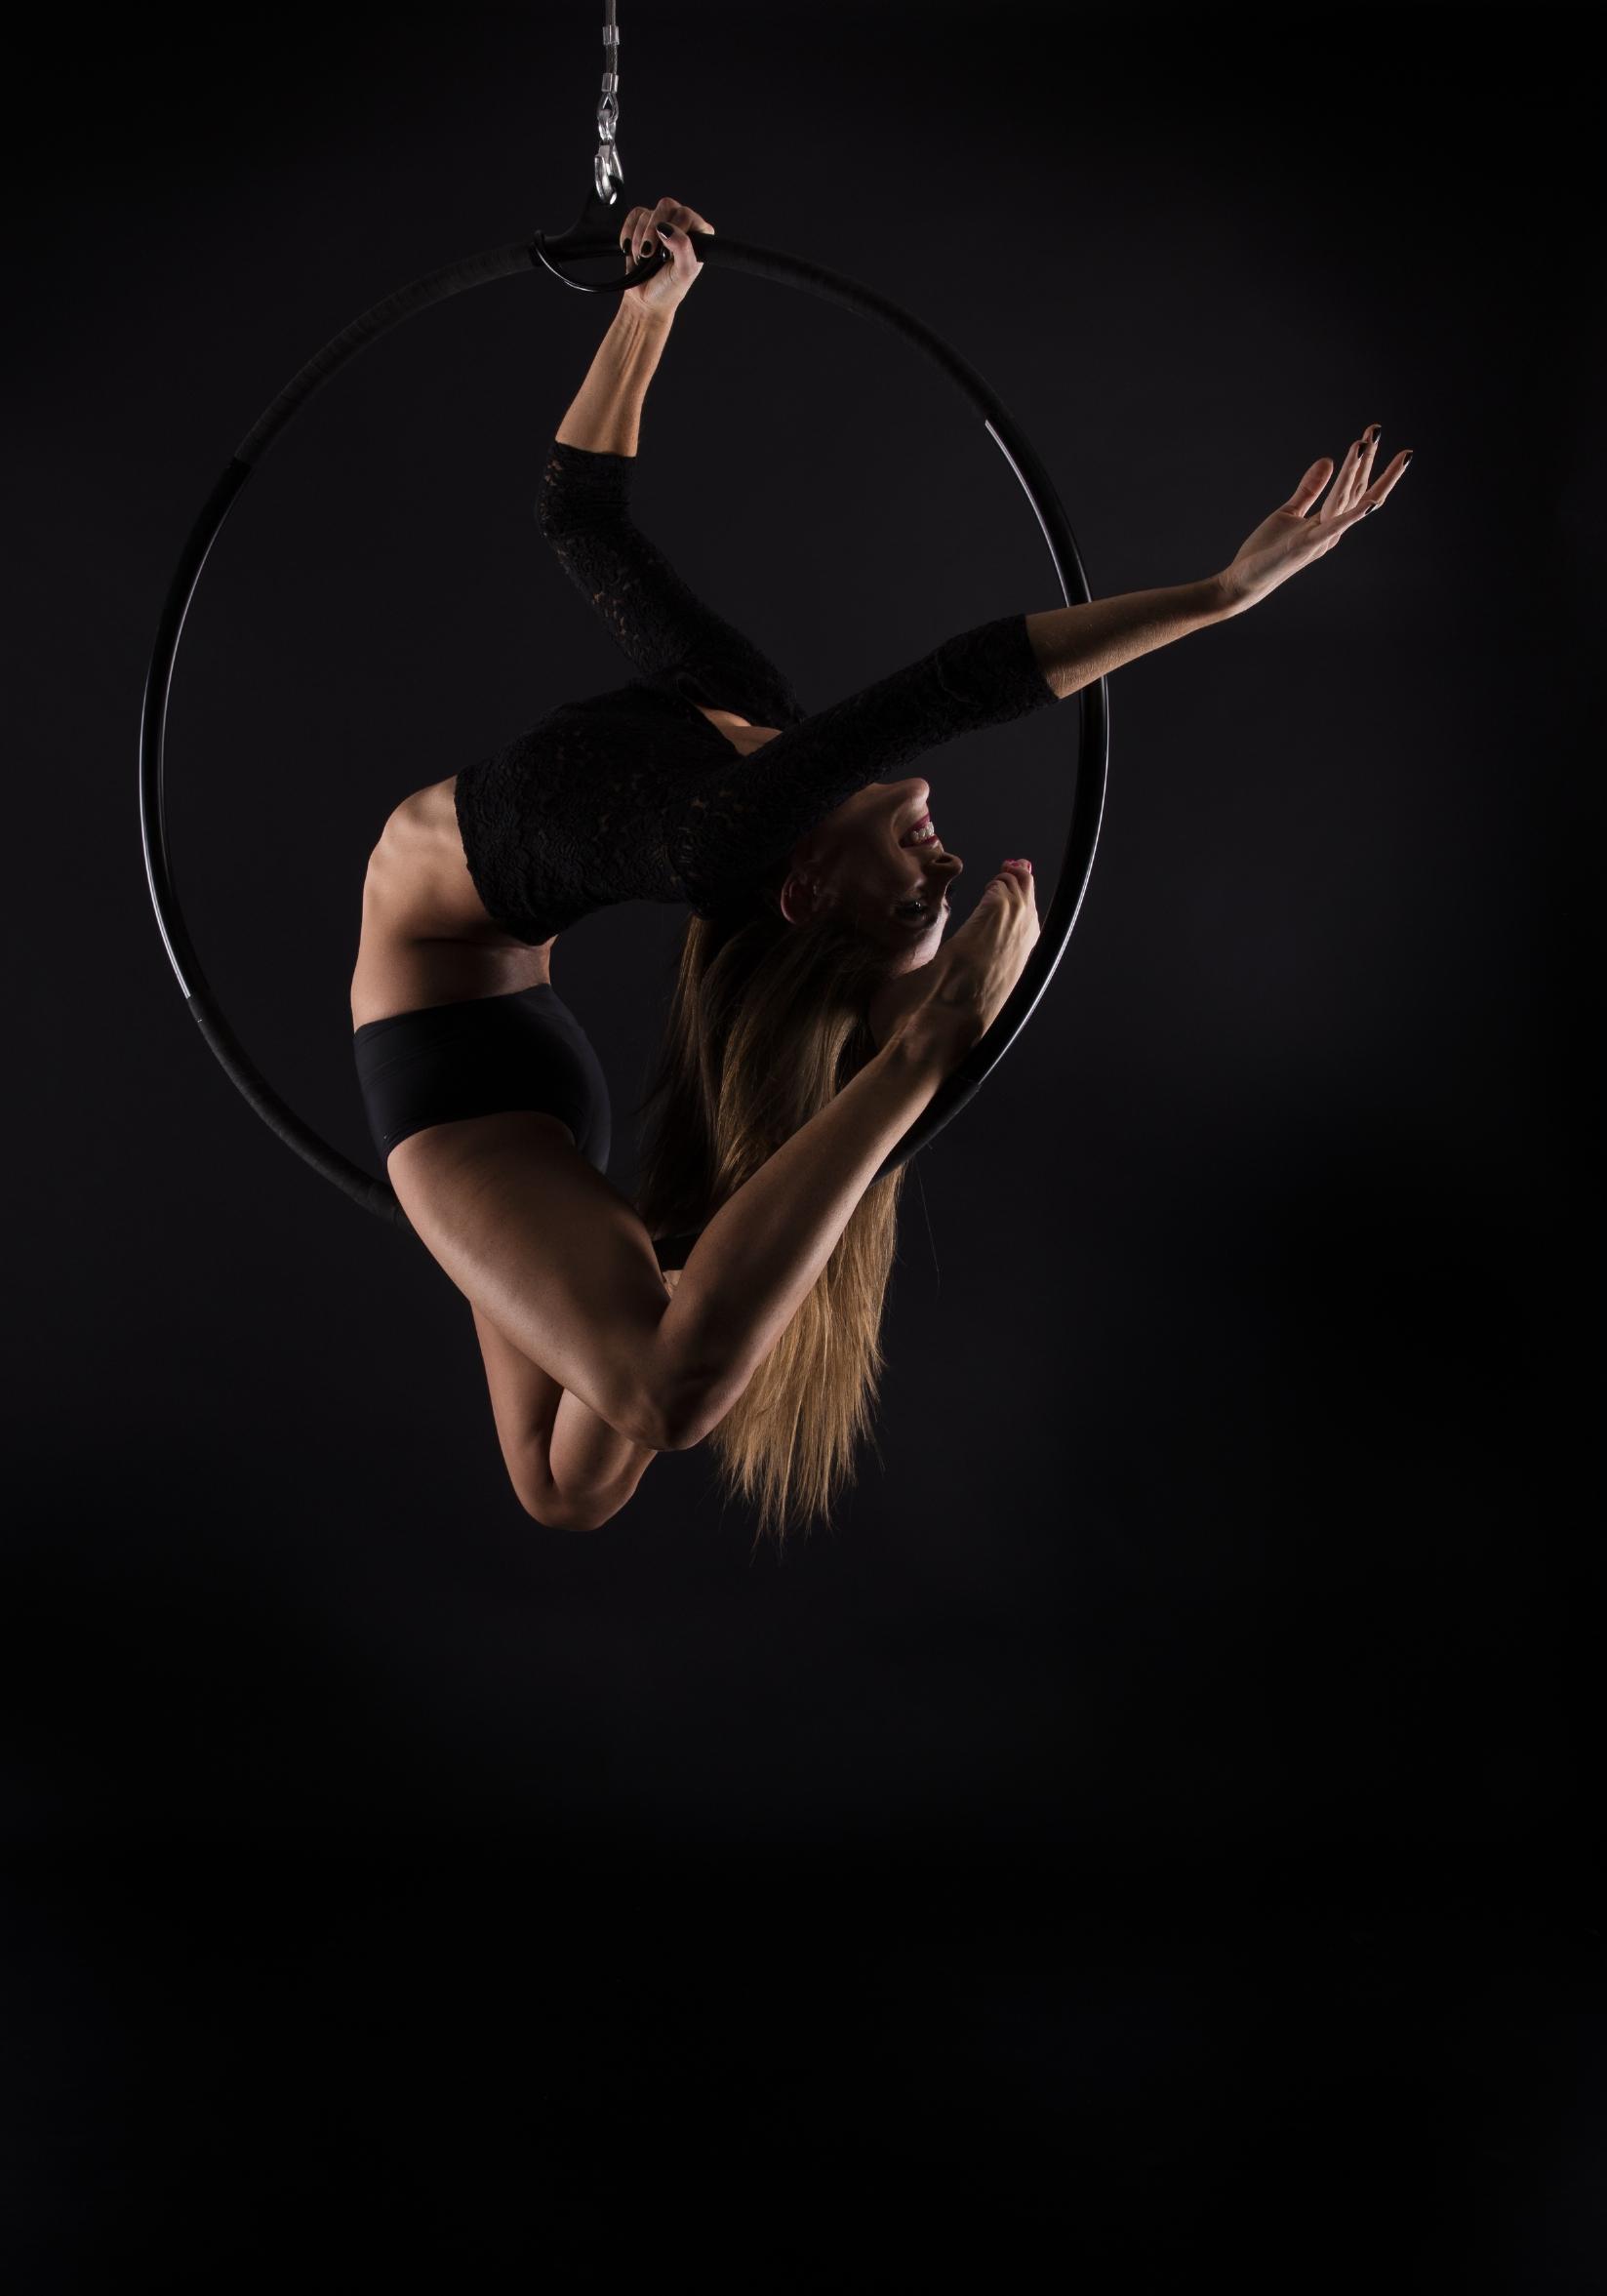 luftring, aerial hoop, luftakrobatin, aerialist berlin, luftartistin,